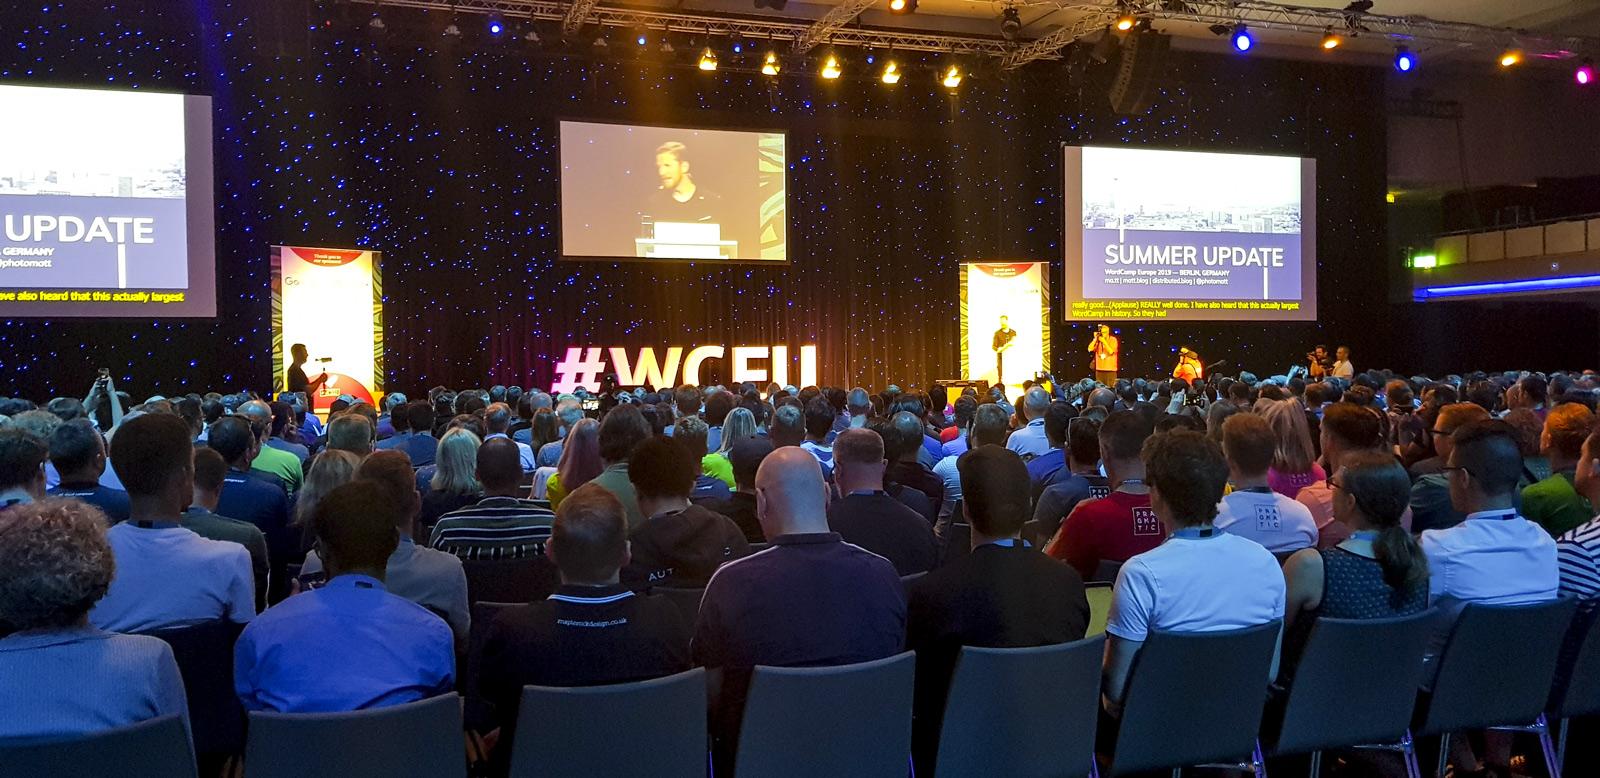 Rückblick auf's WordCamp Europe 2019 in Berlin